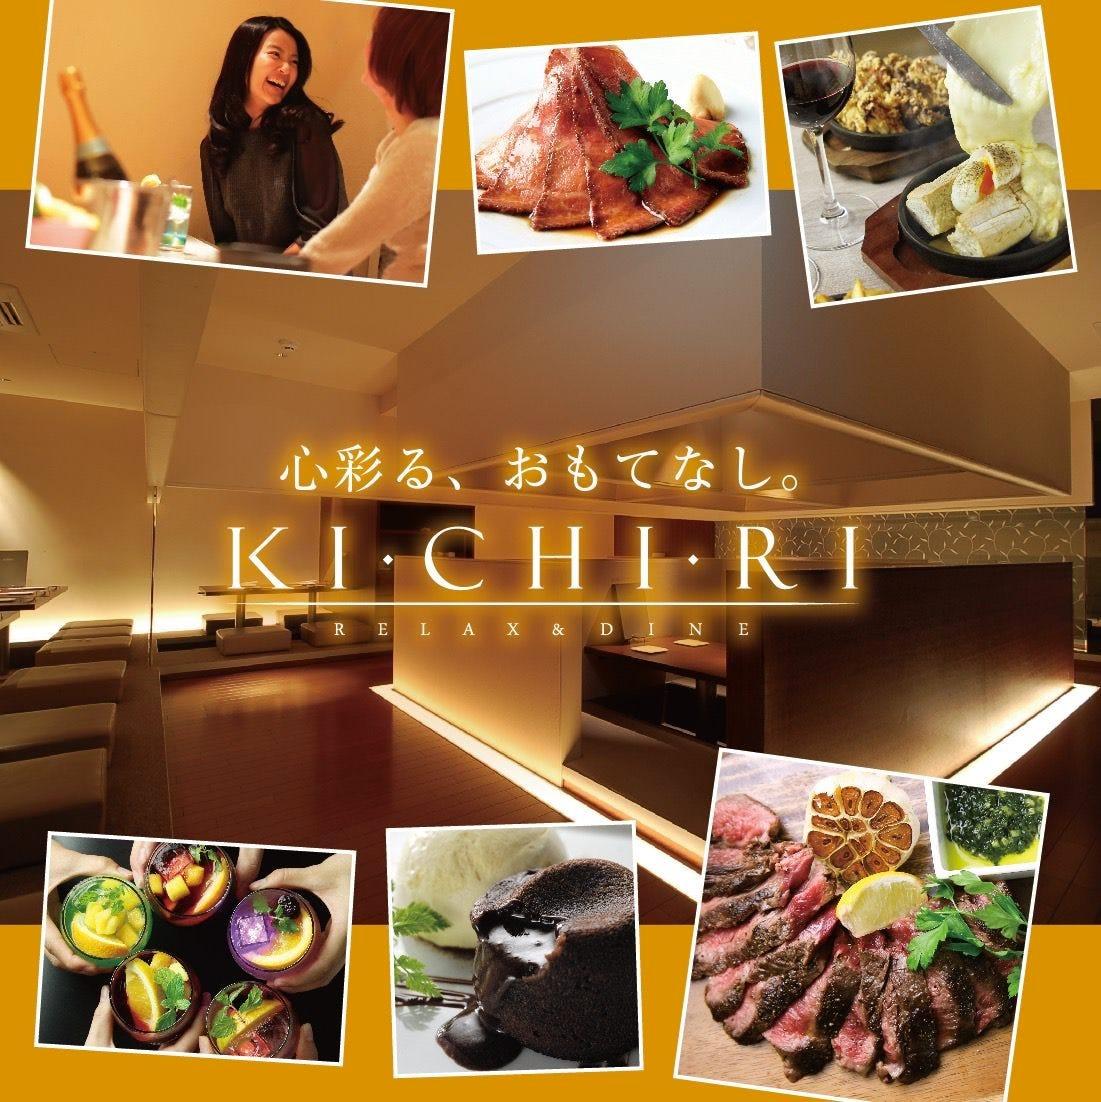 KICHIRI 大和八木店のイメージ写真